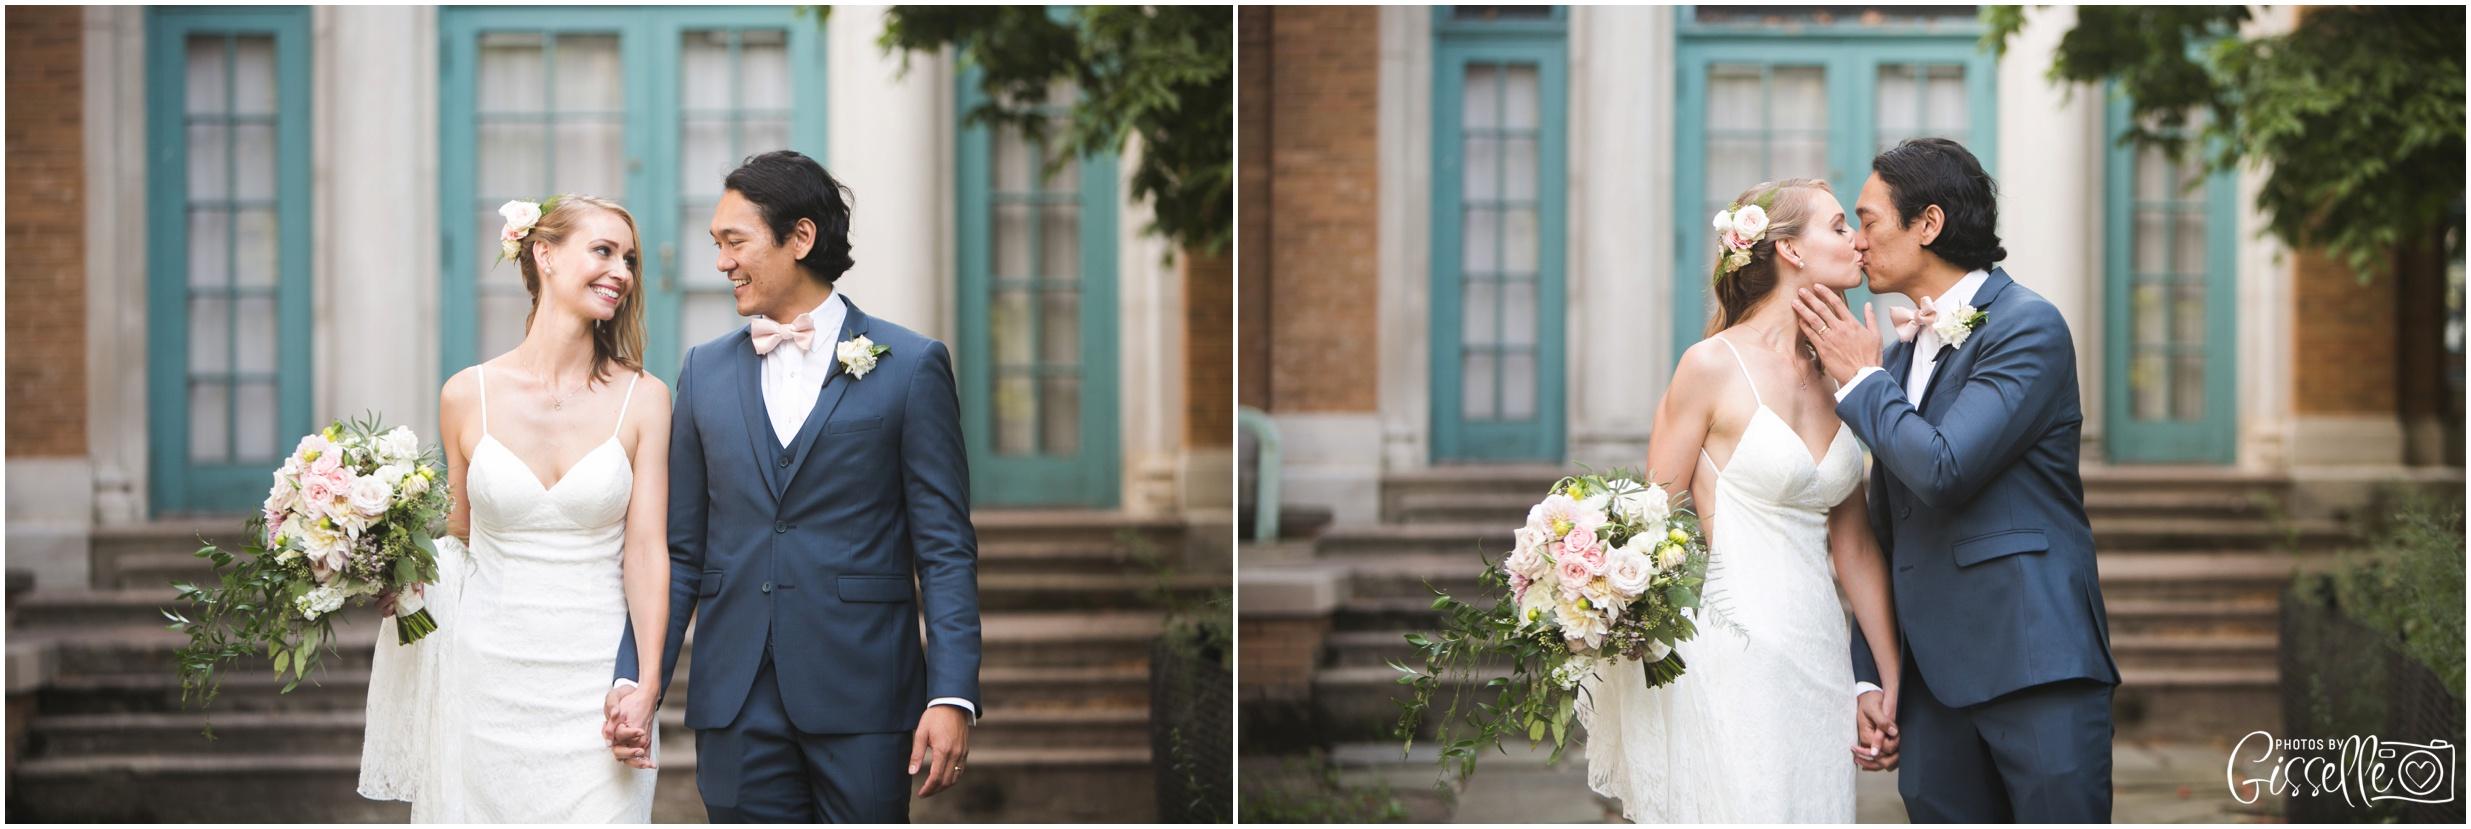 Columbus Park Refectory Wedding_0019.jpg